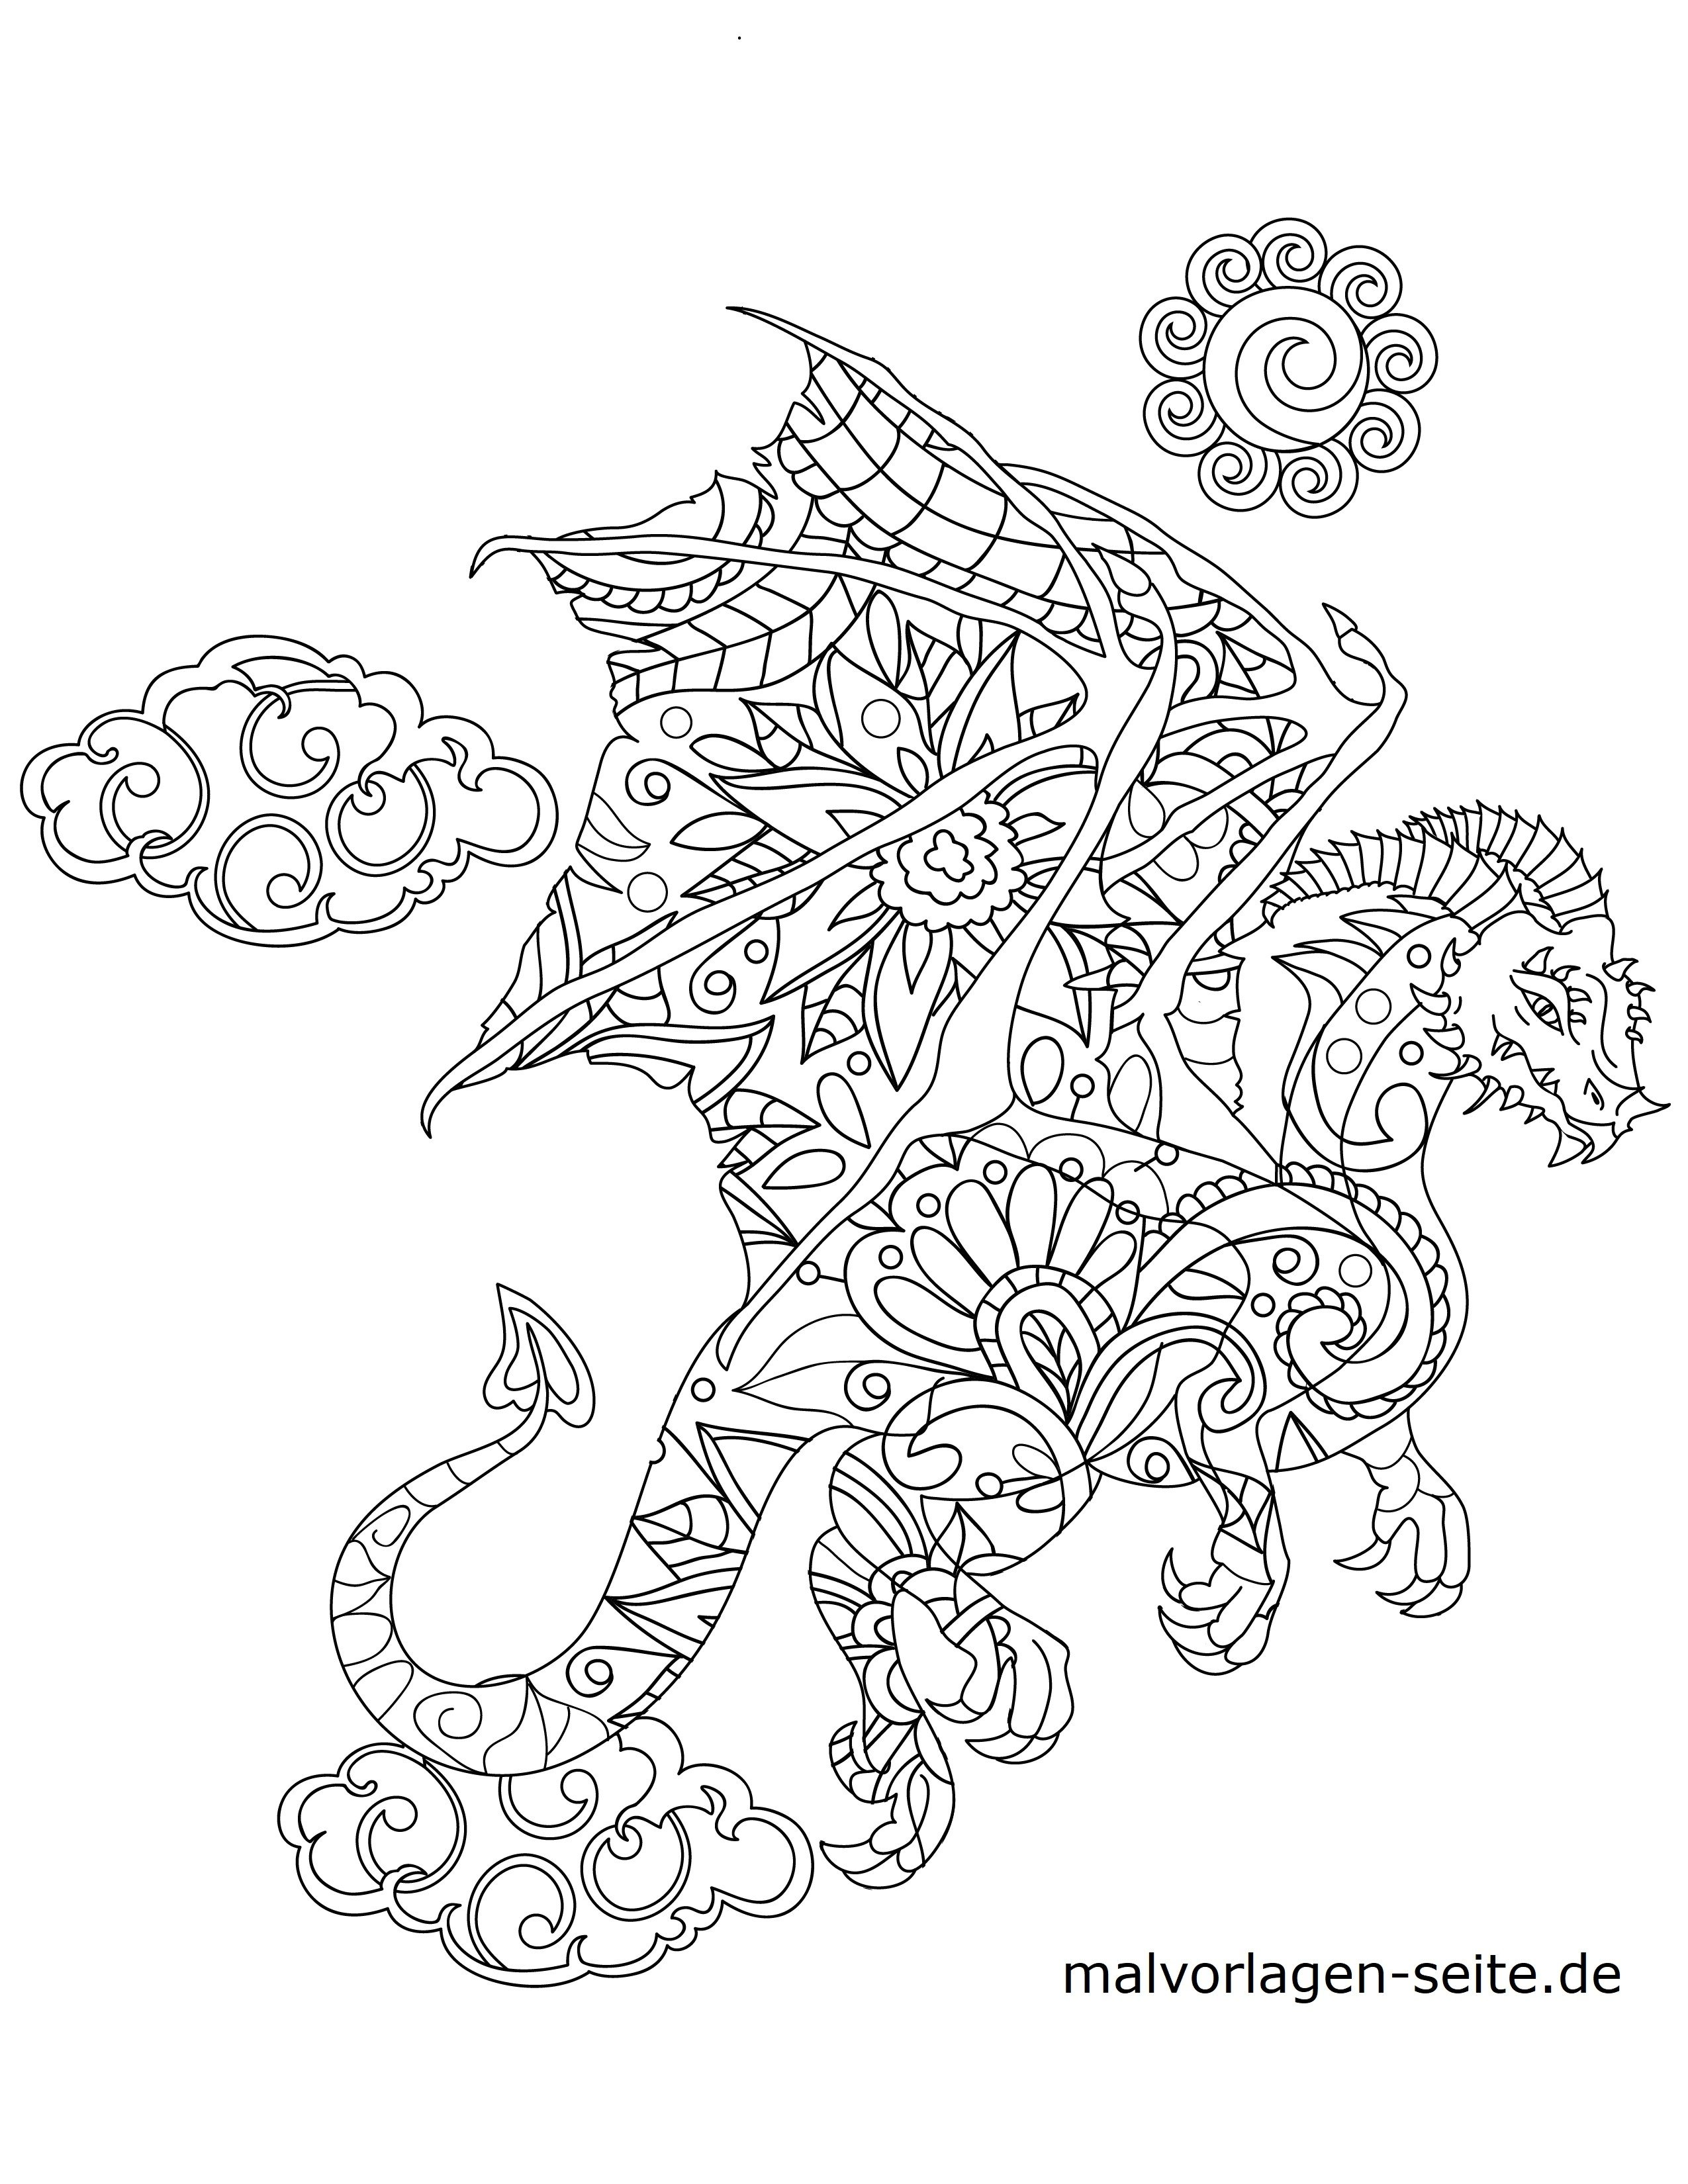 Malvorlage Mosaik Drache Tiere Mandalas